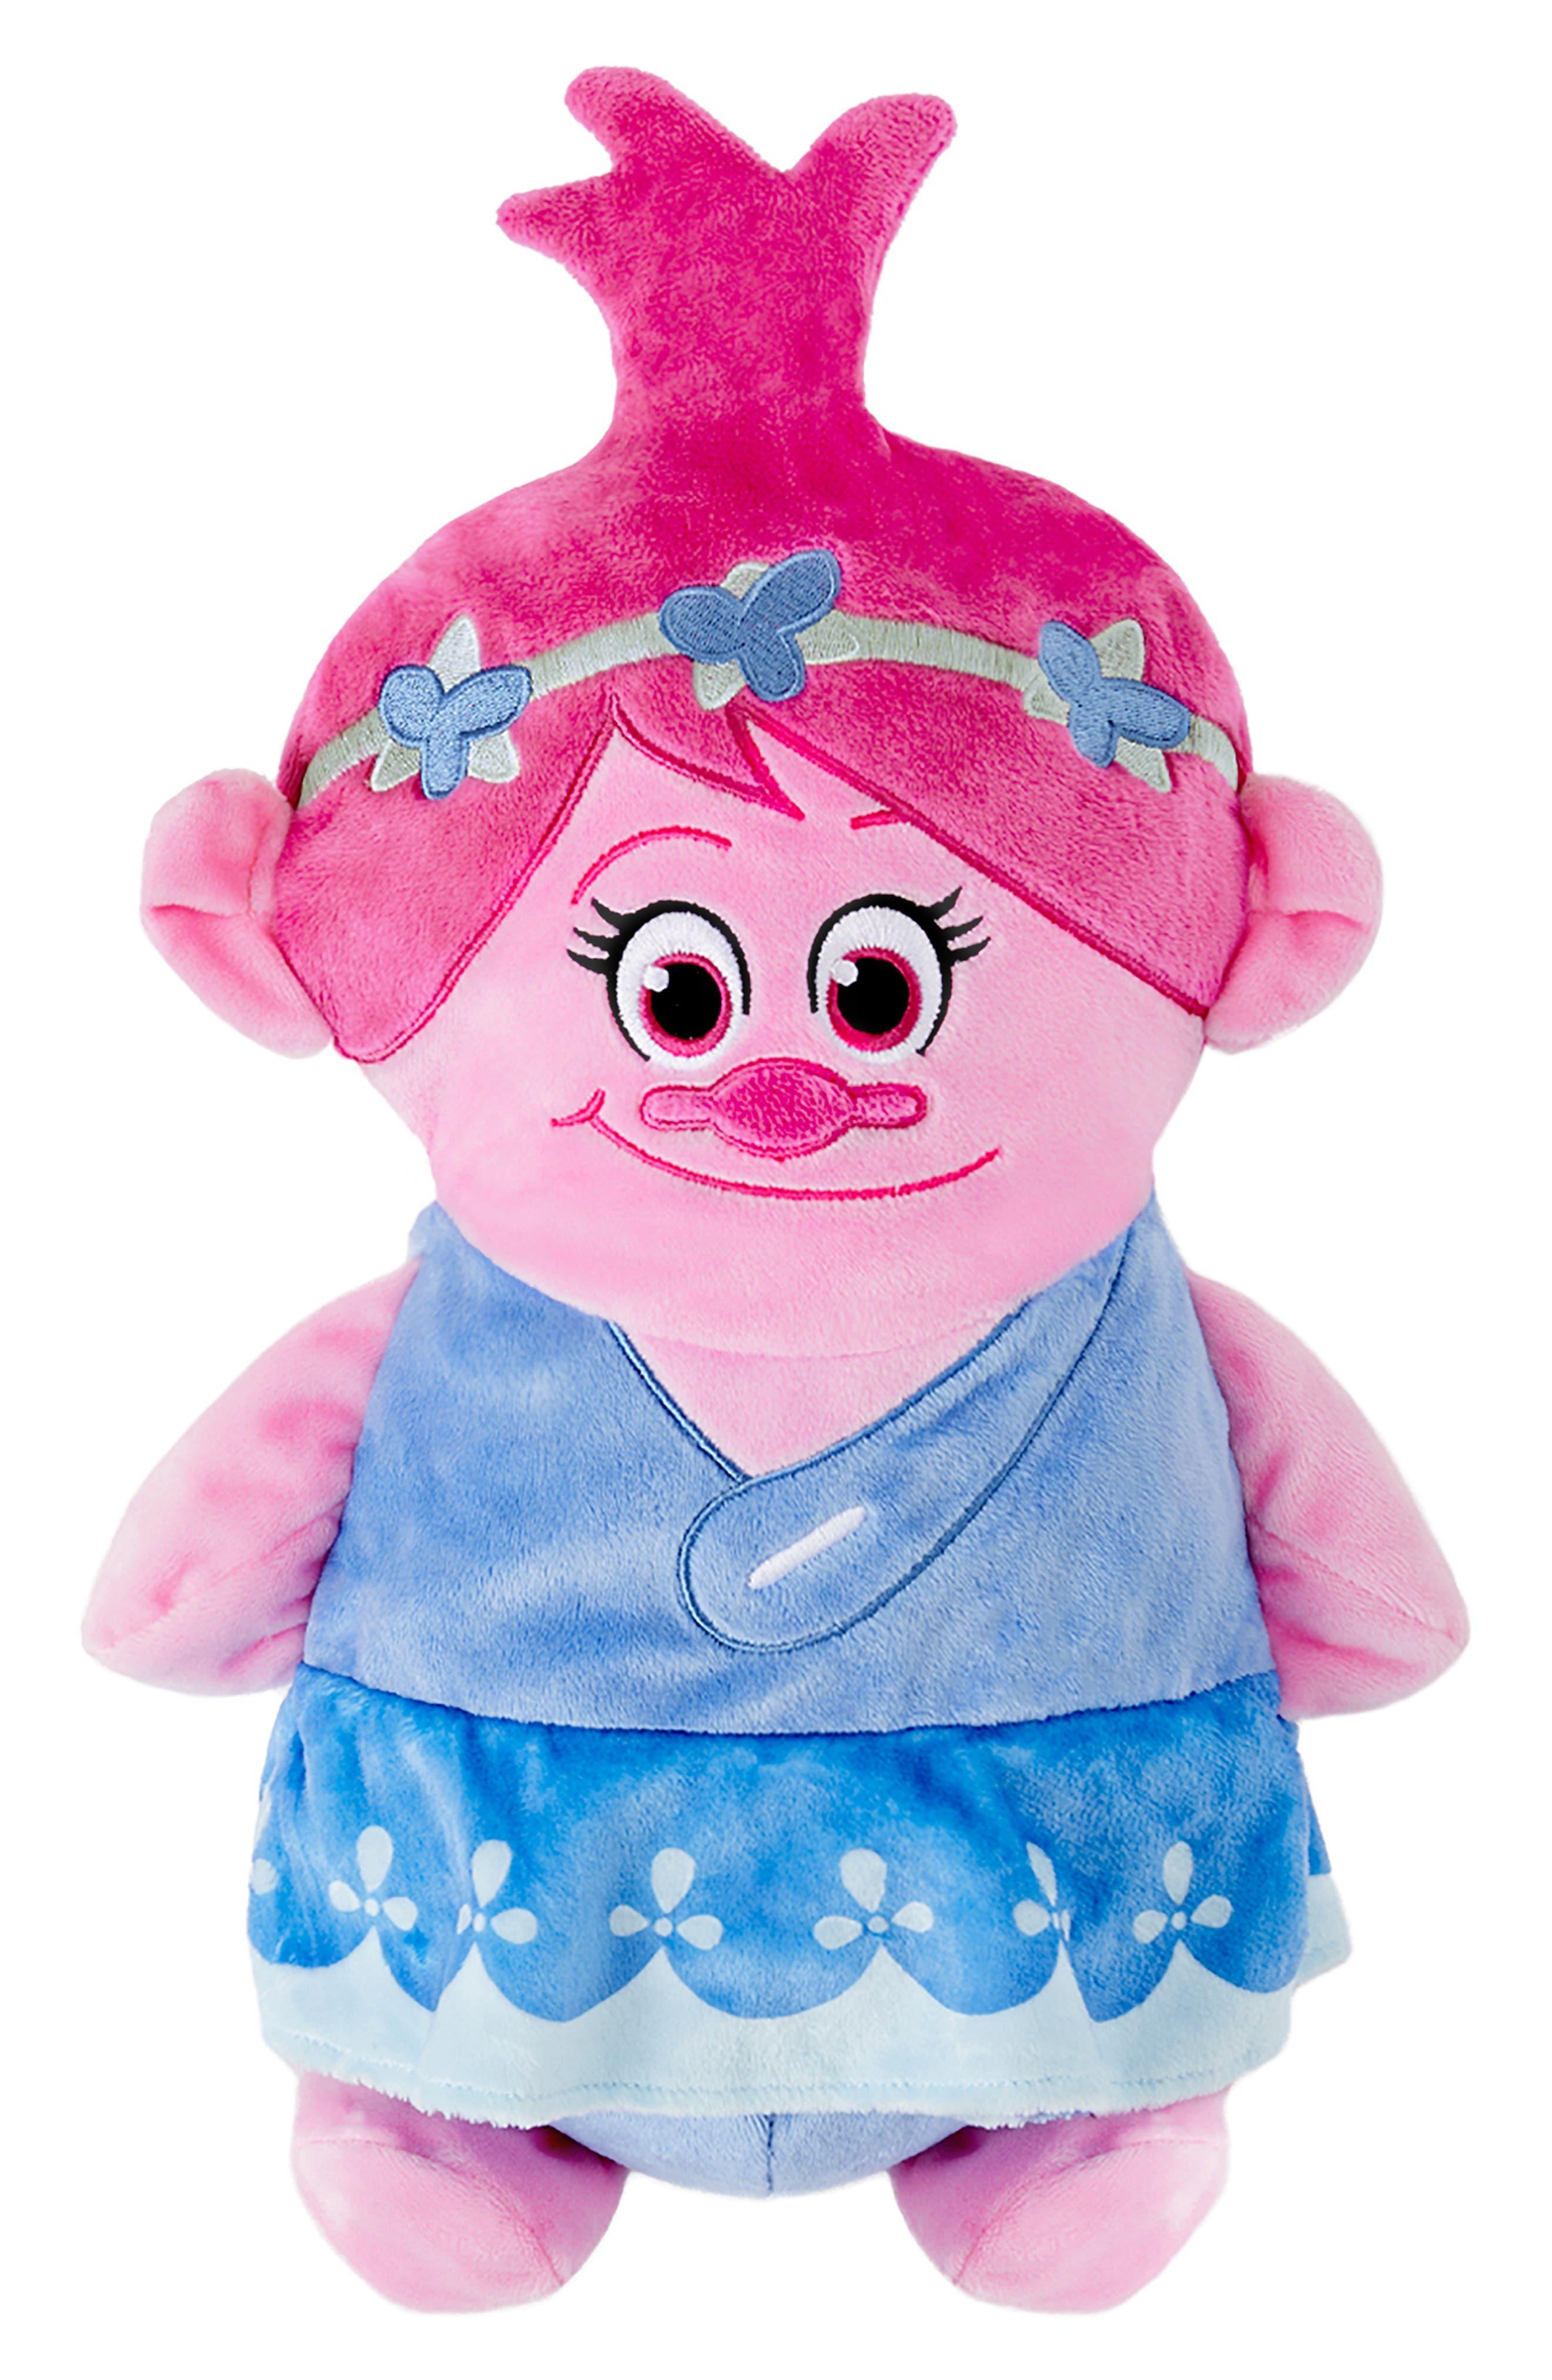 DreamWorks Trolls Poppy 2-in-1 Stuffed Animal Hoodie,                         Main,                         color, PINK MIX